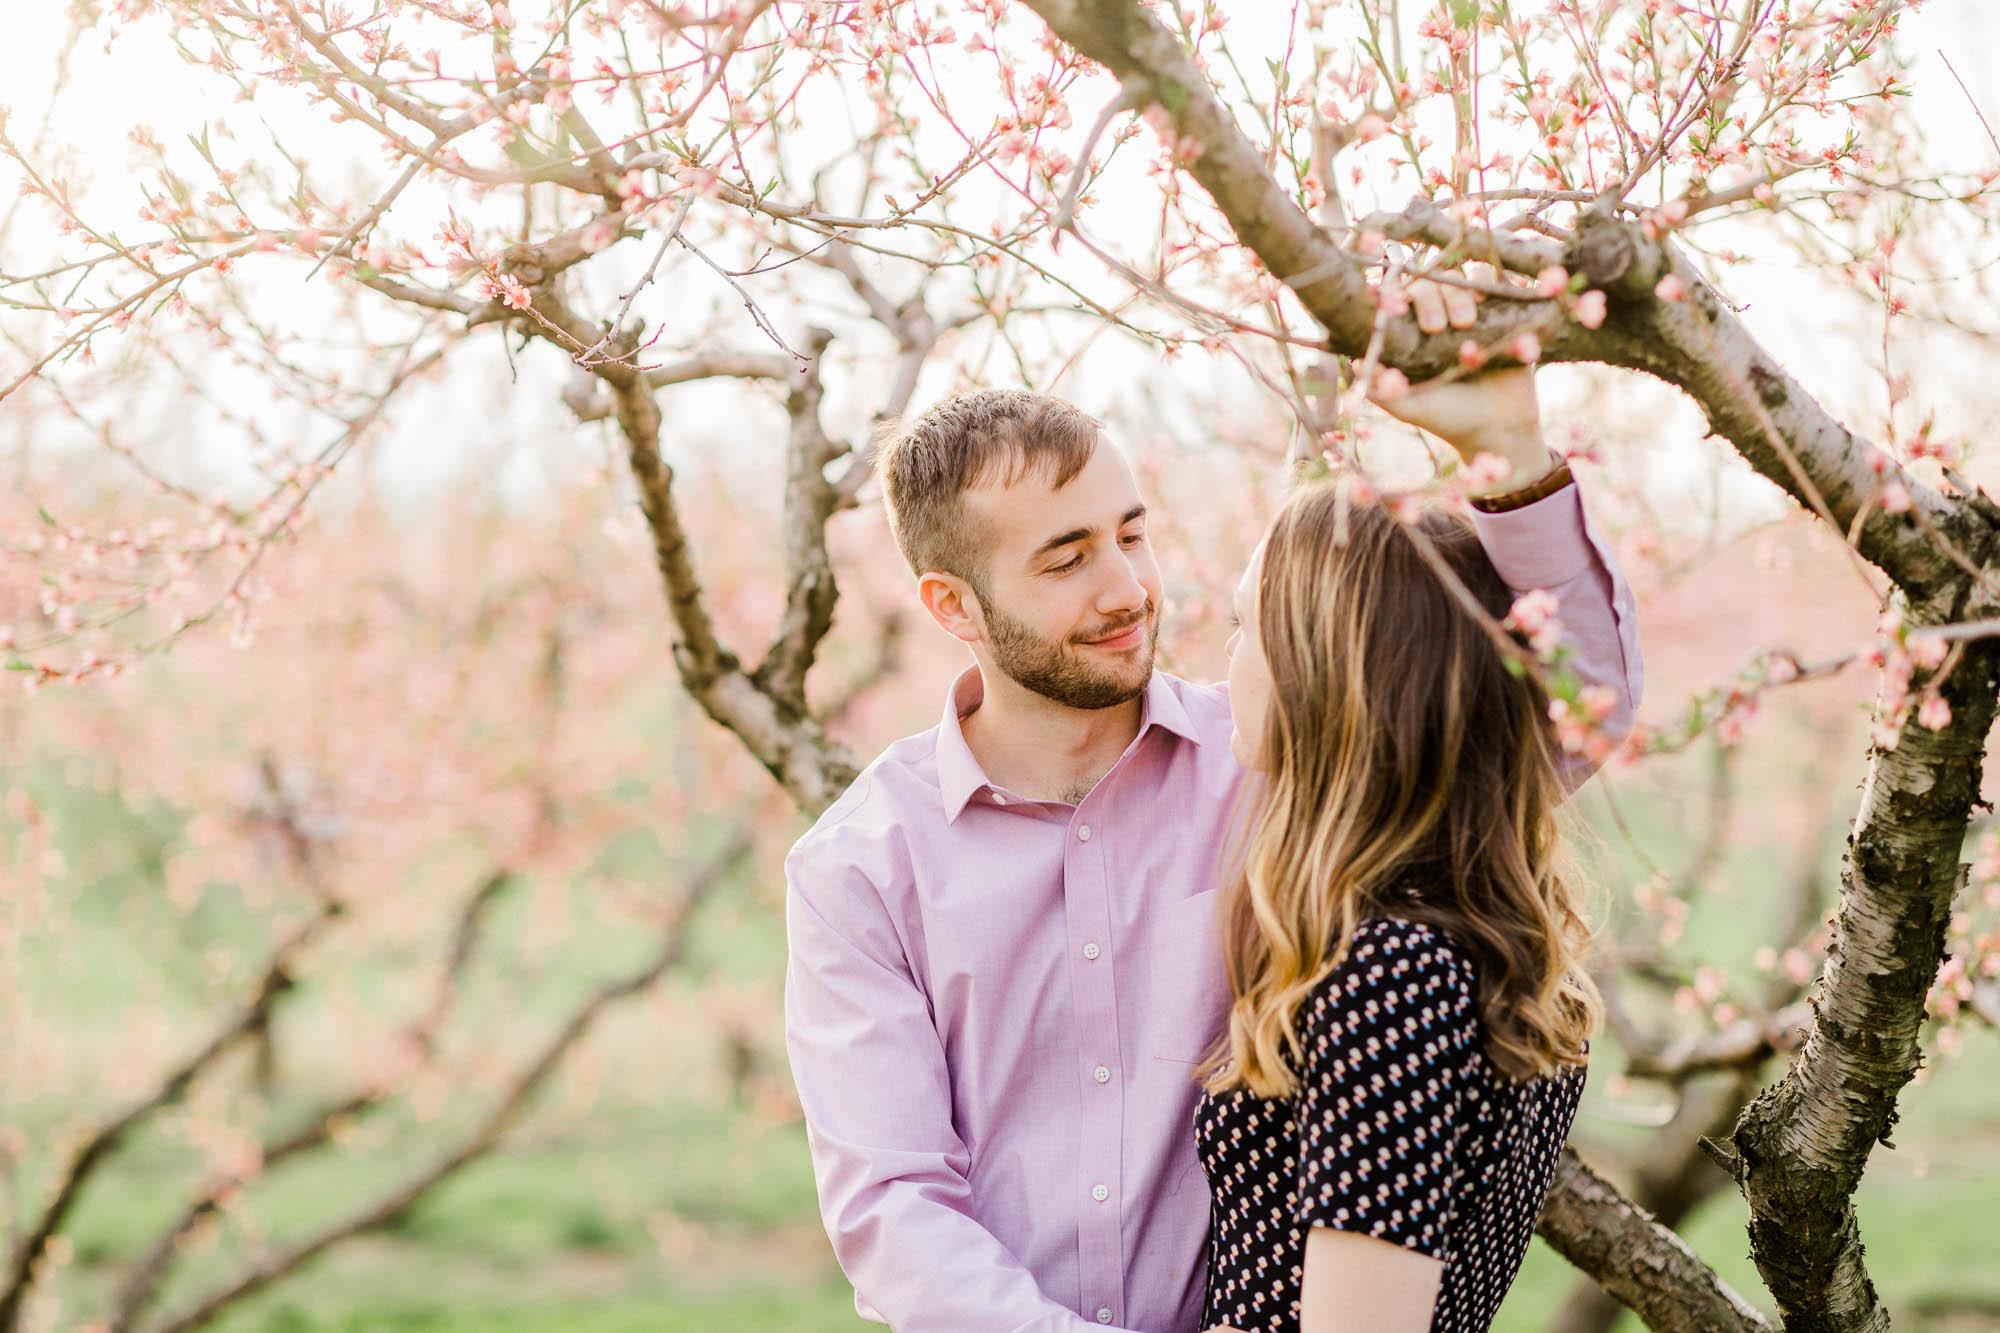 Rohrbachs-Spring-cherry-blossom-engagement-7585.jpg